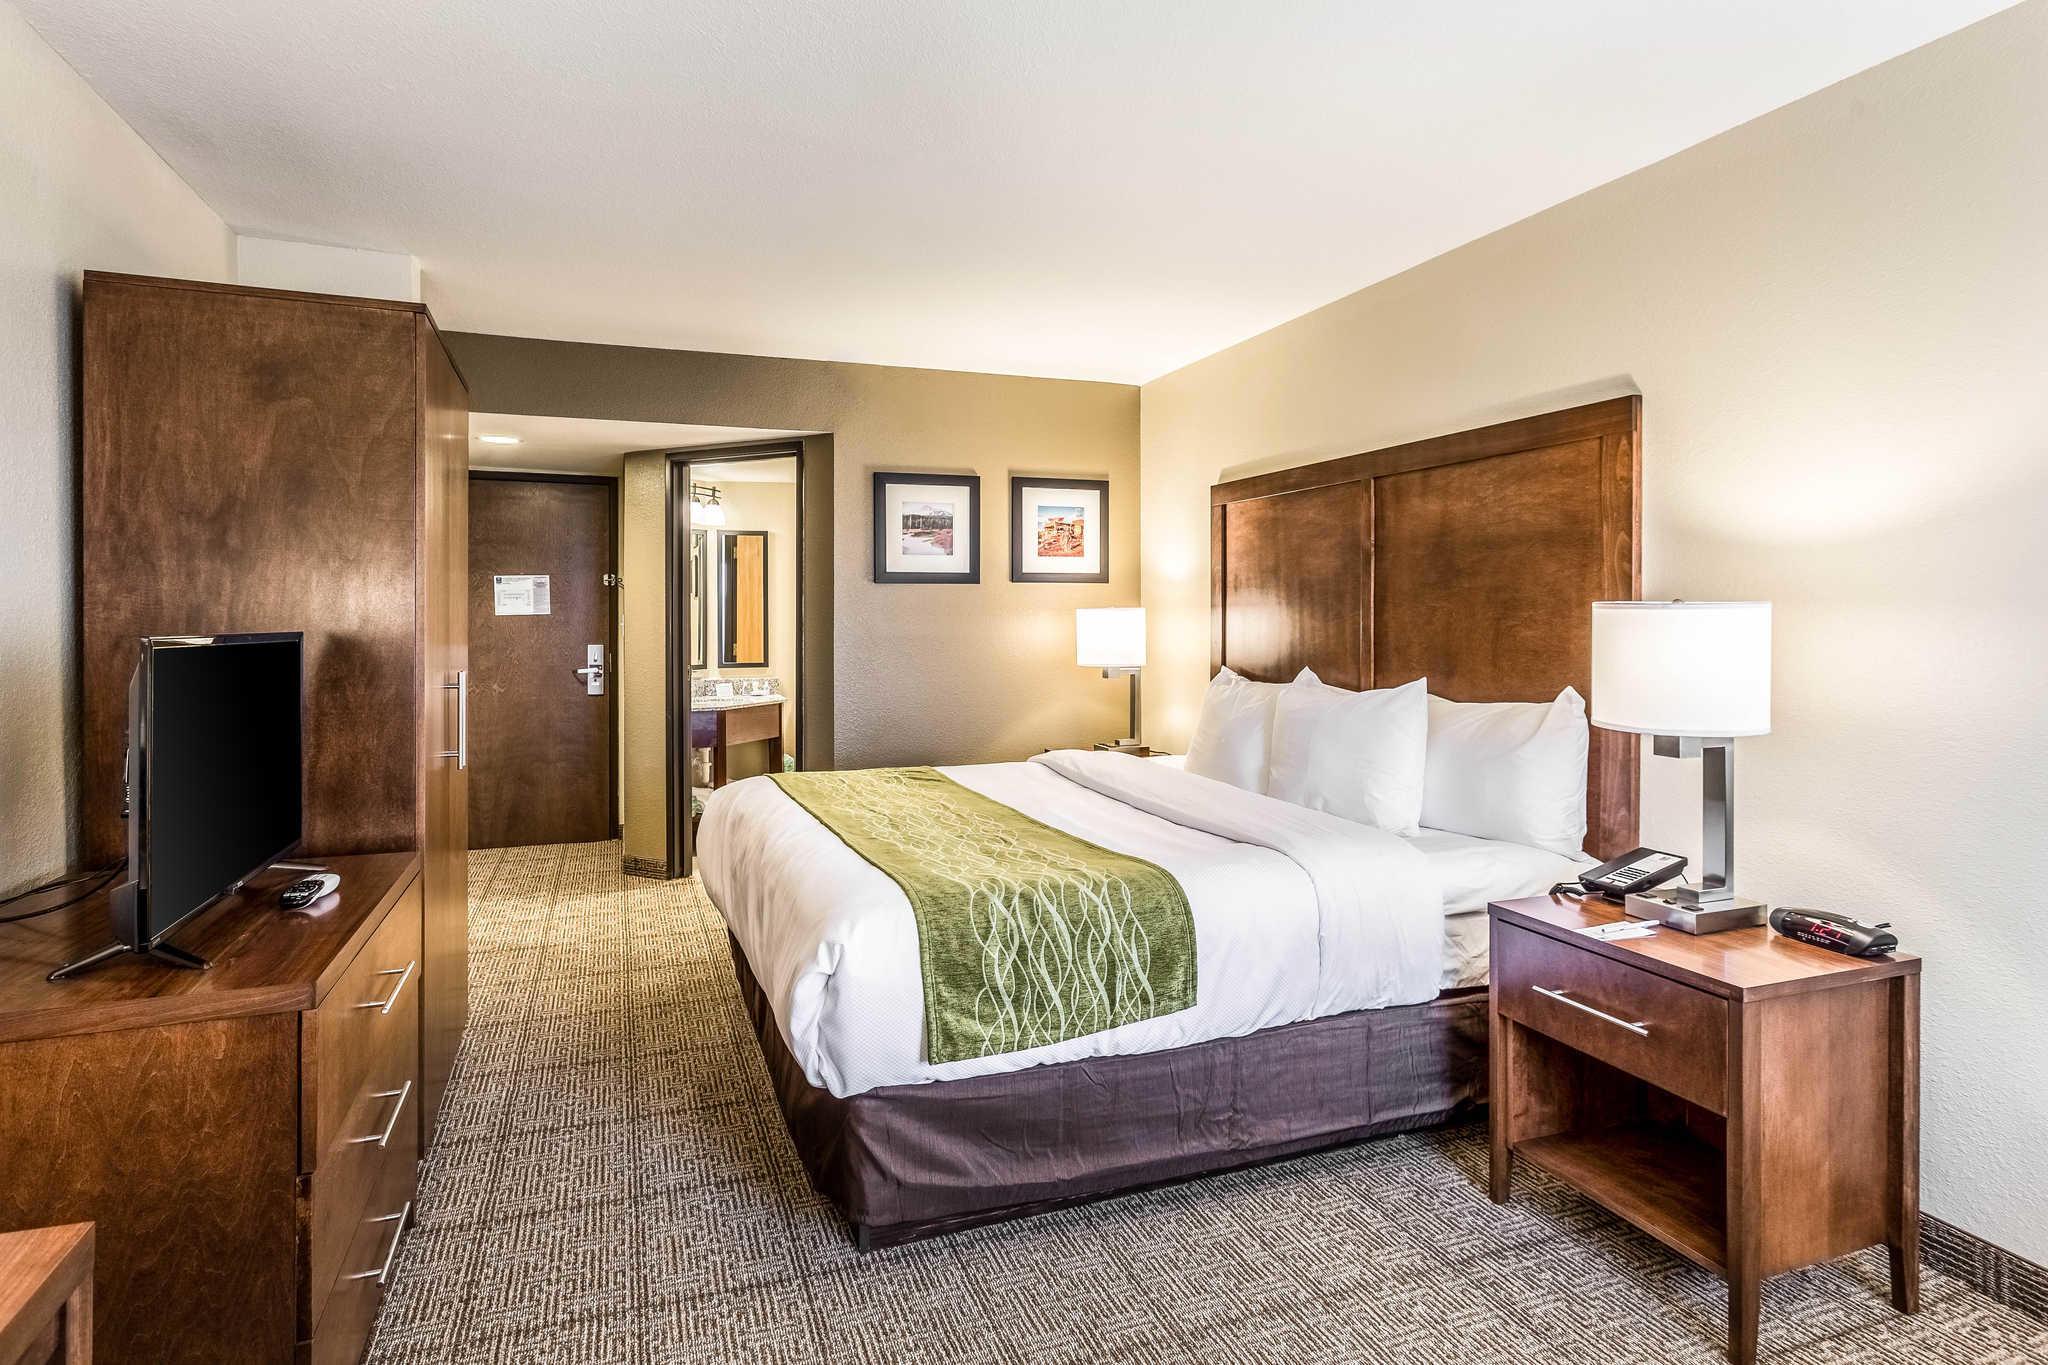 Comfort Inn & Suites Albuquerque Downtown image 11